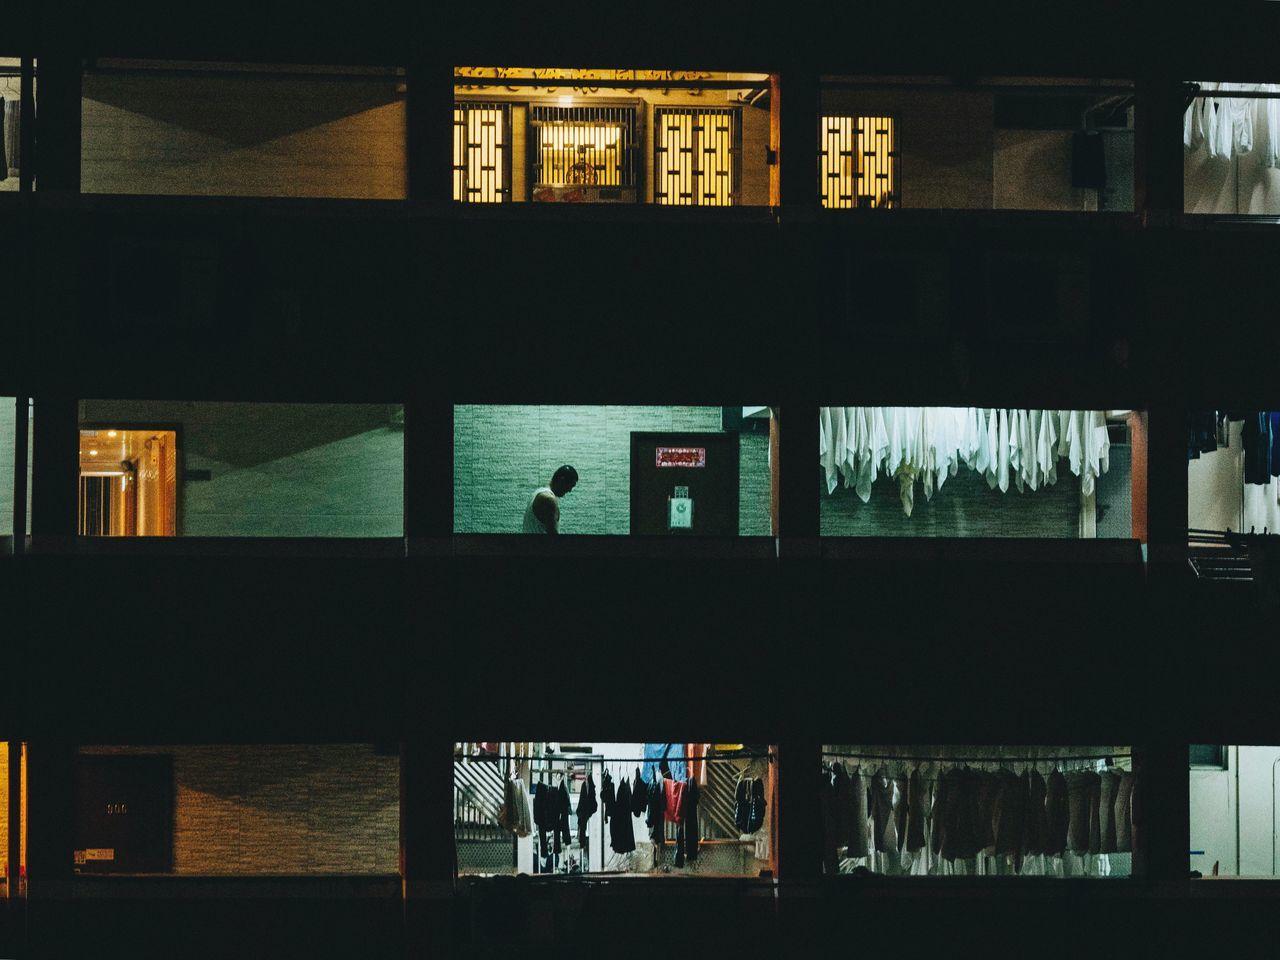 Hong Kong life EyeEmBestPics EyeEm Best Shots Embrace Urban Life